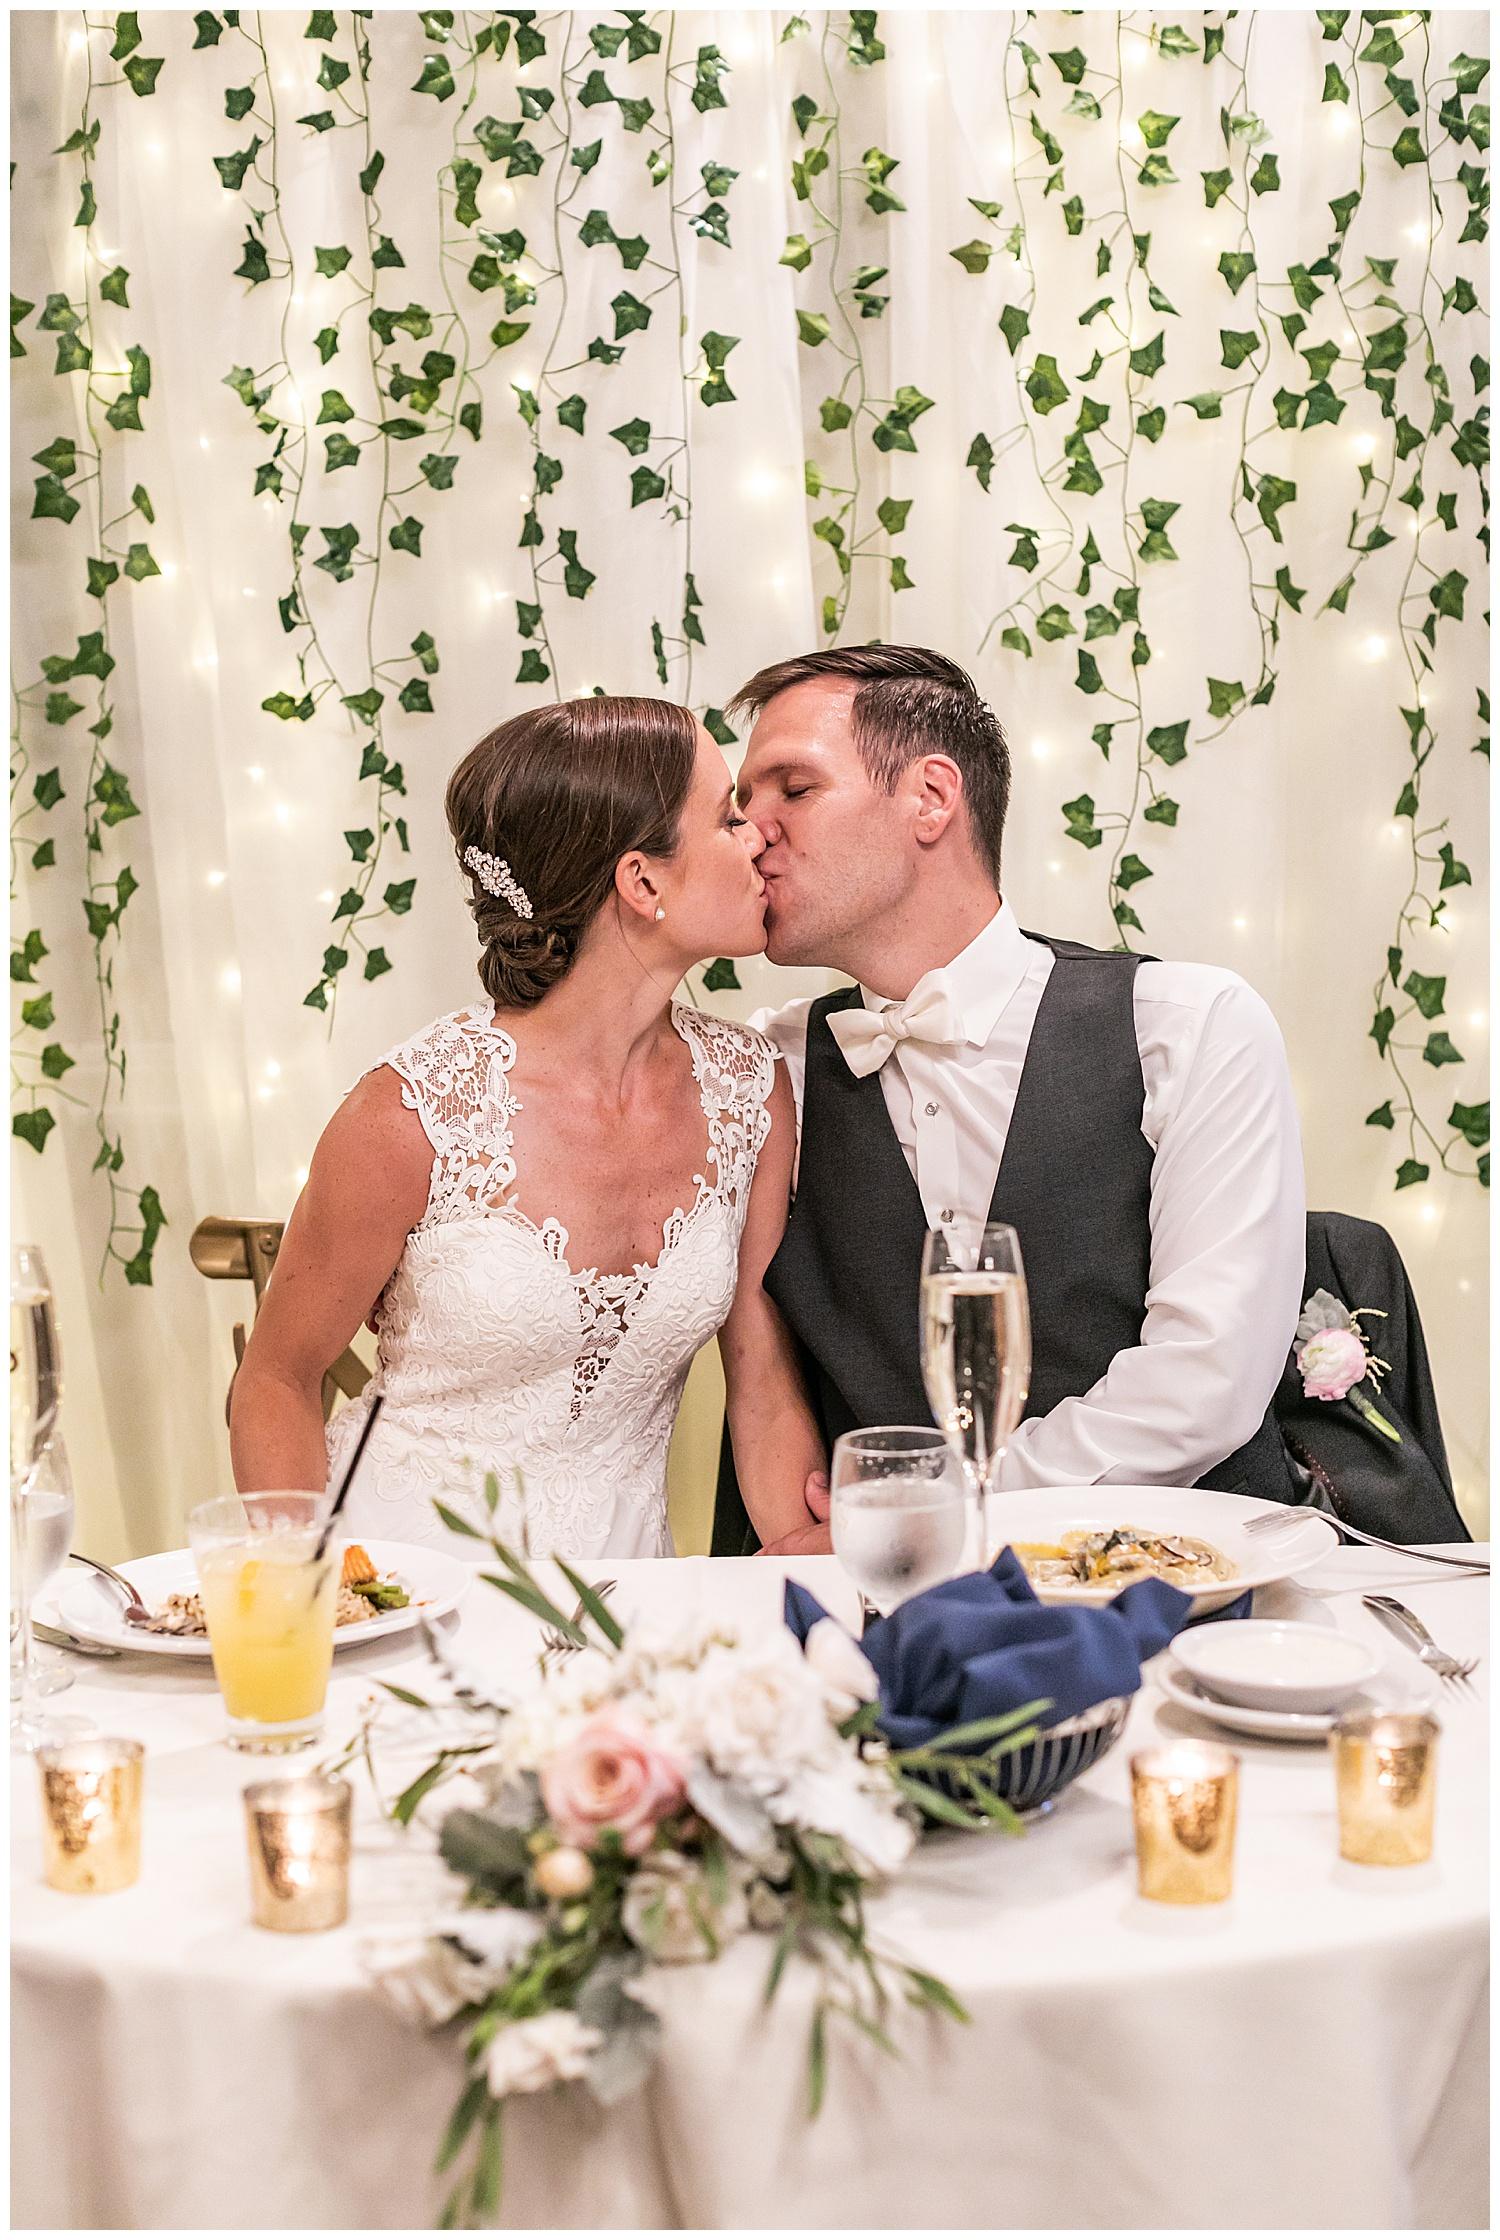 Lindsay Josh Eagles Nest Country Club Wedding Living Radiant Photography photos_0112.jpg